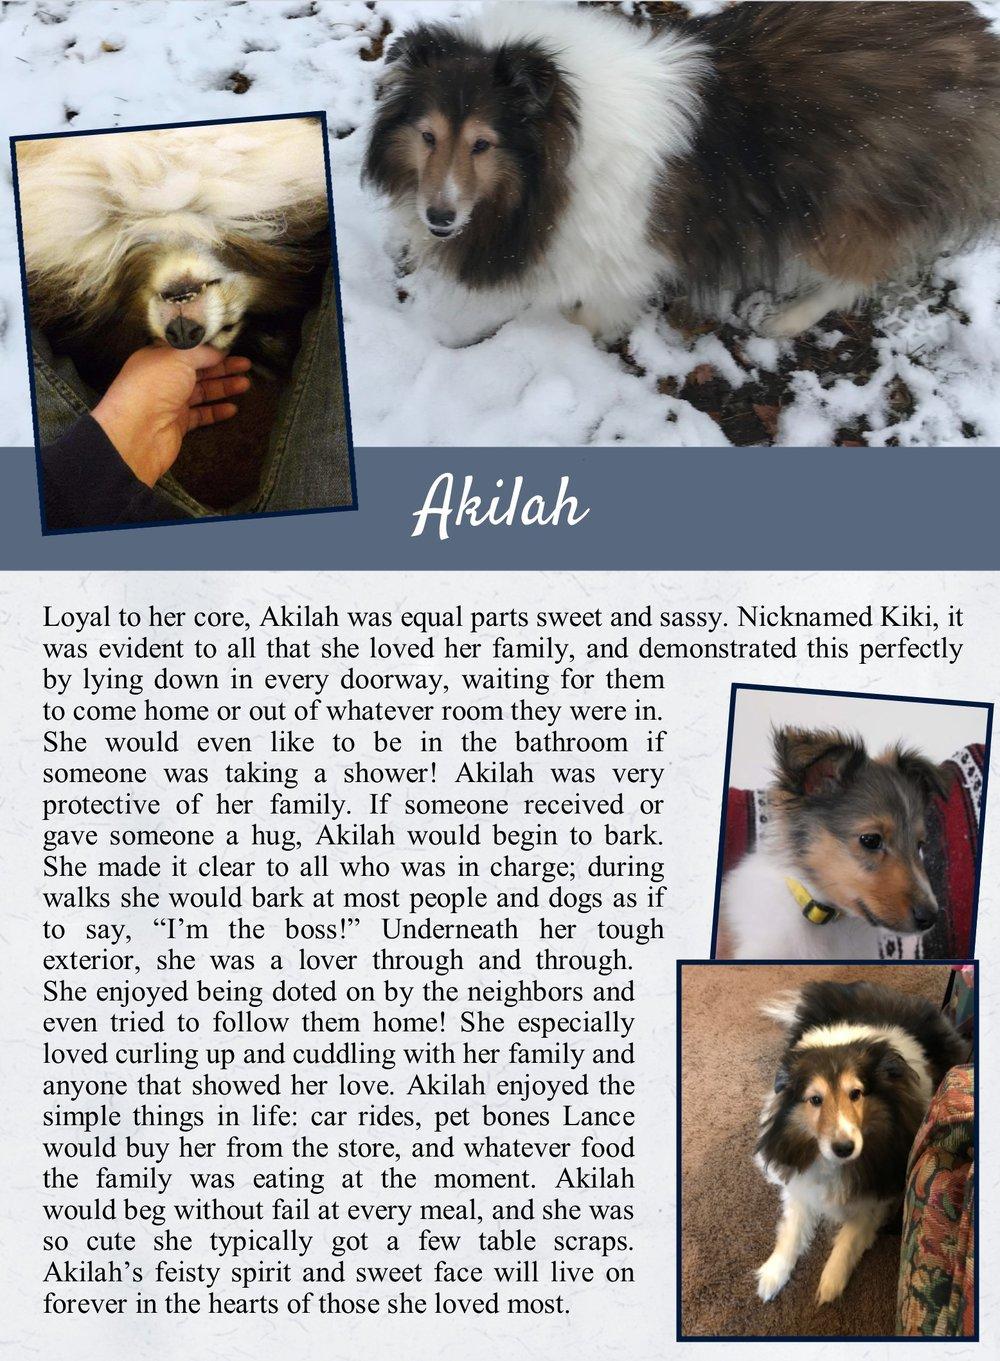 Akilah's Life Tail